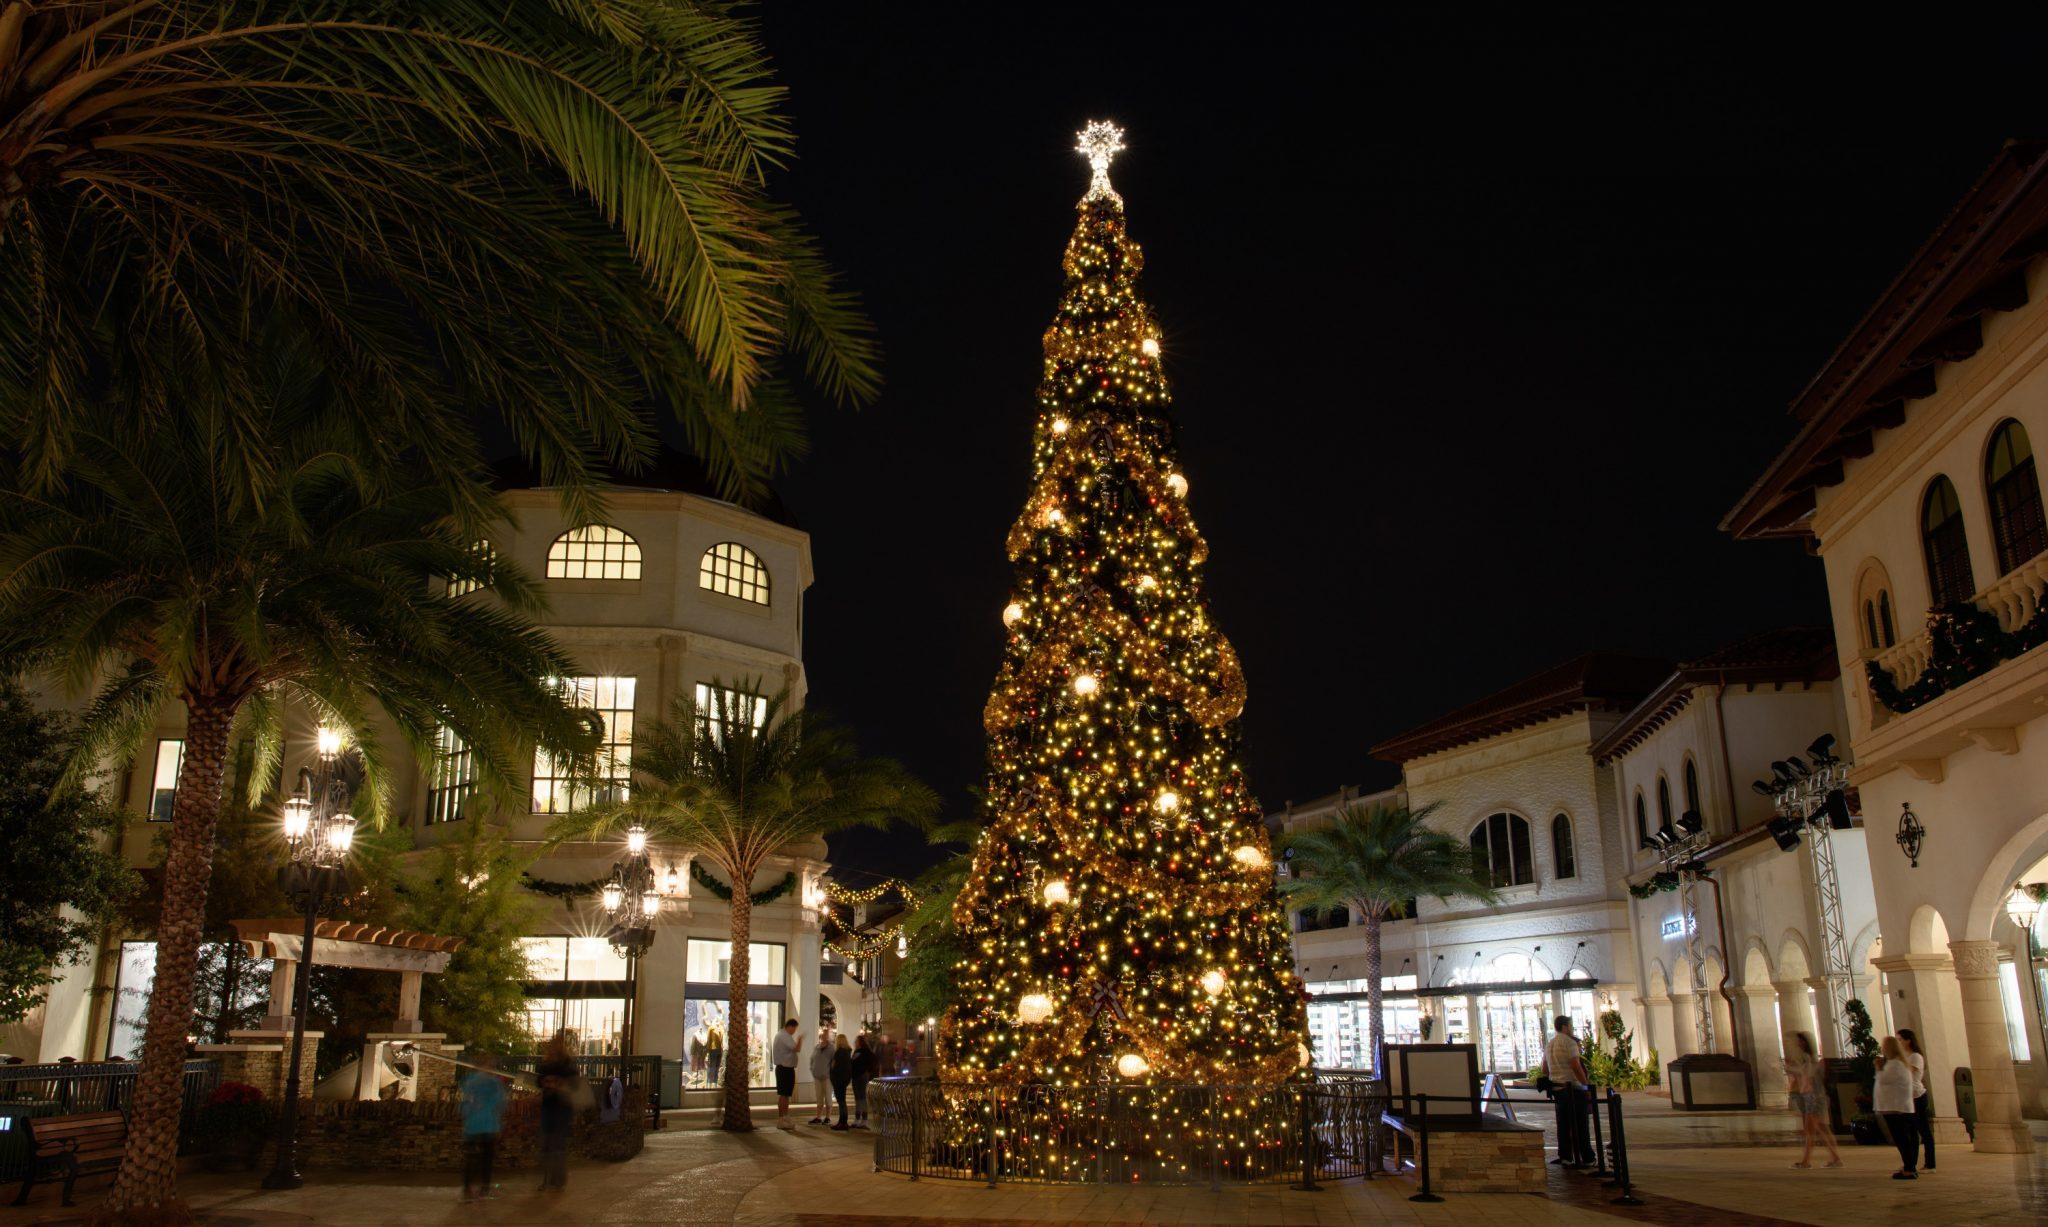 ResortLoop.com Episode 378 – Christmastime Offerings at Walt Disney World